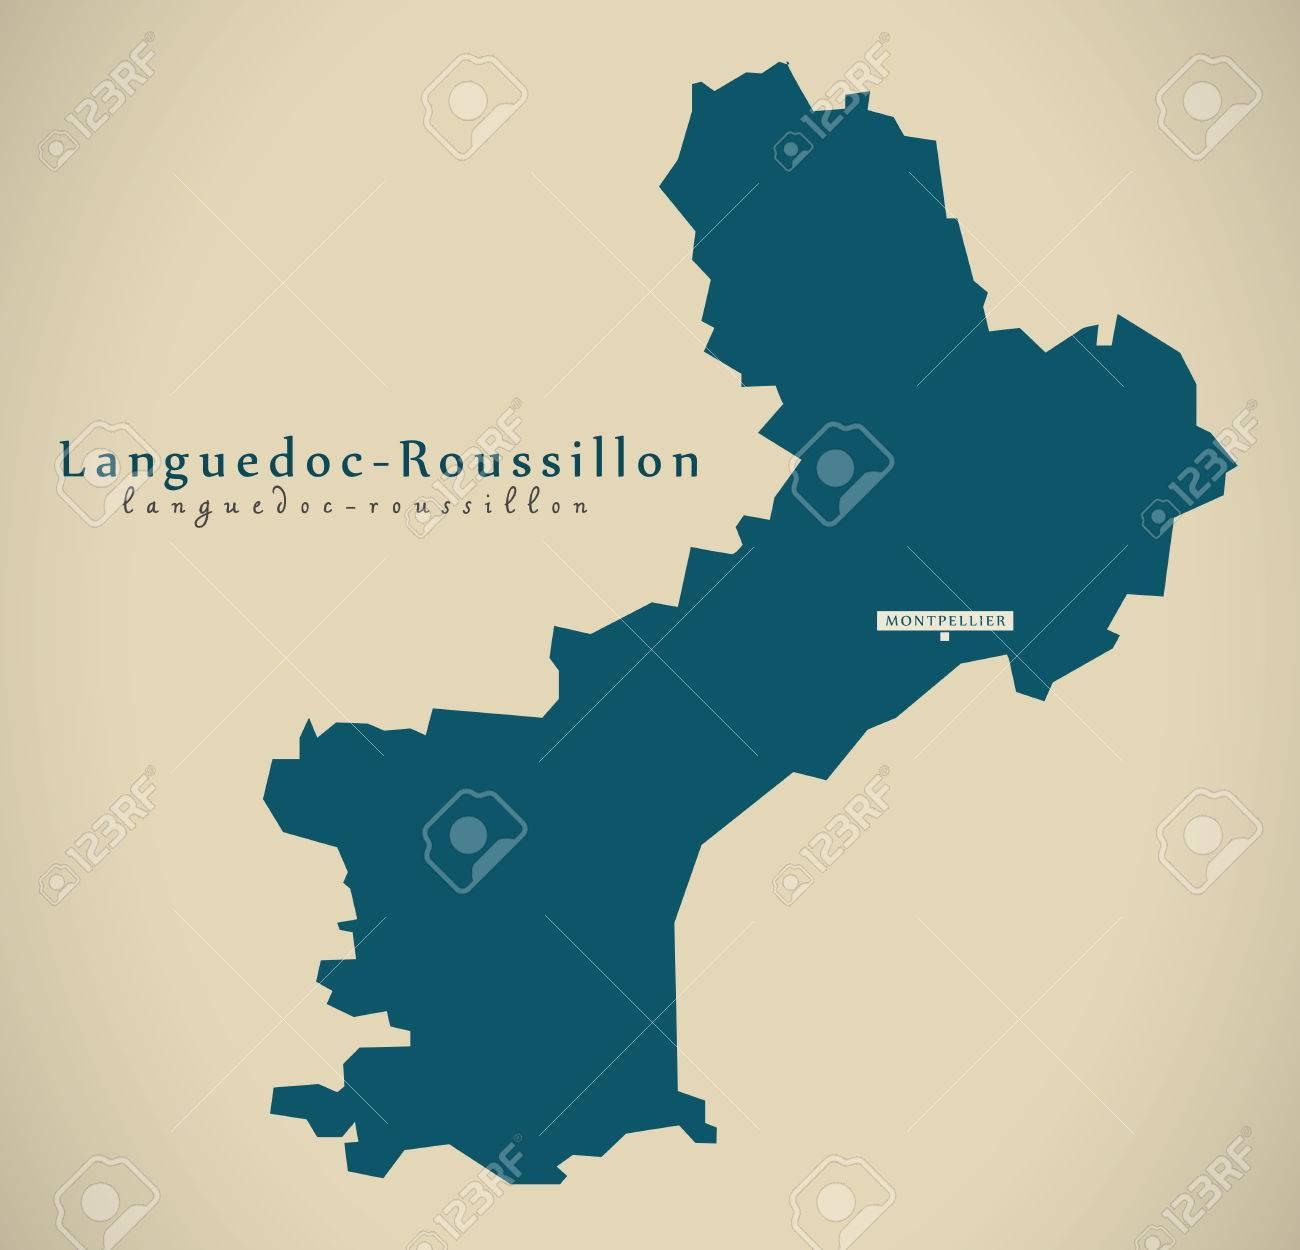 Roussillon France Map.Modern Map Languedoc Roussillon France Fr Illustration Stock Photo